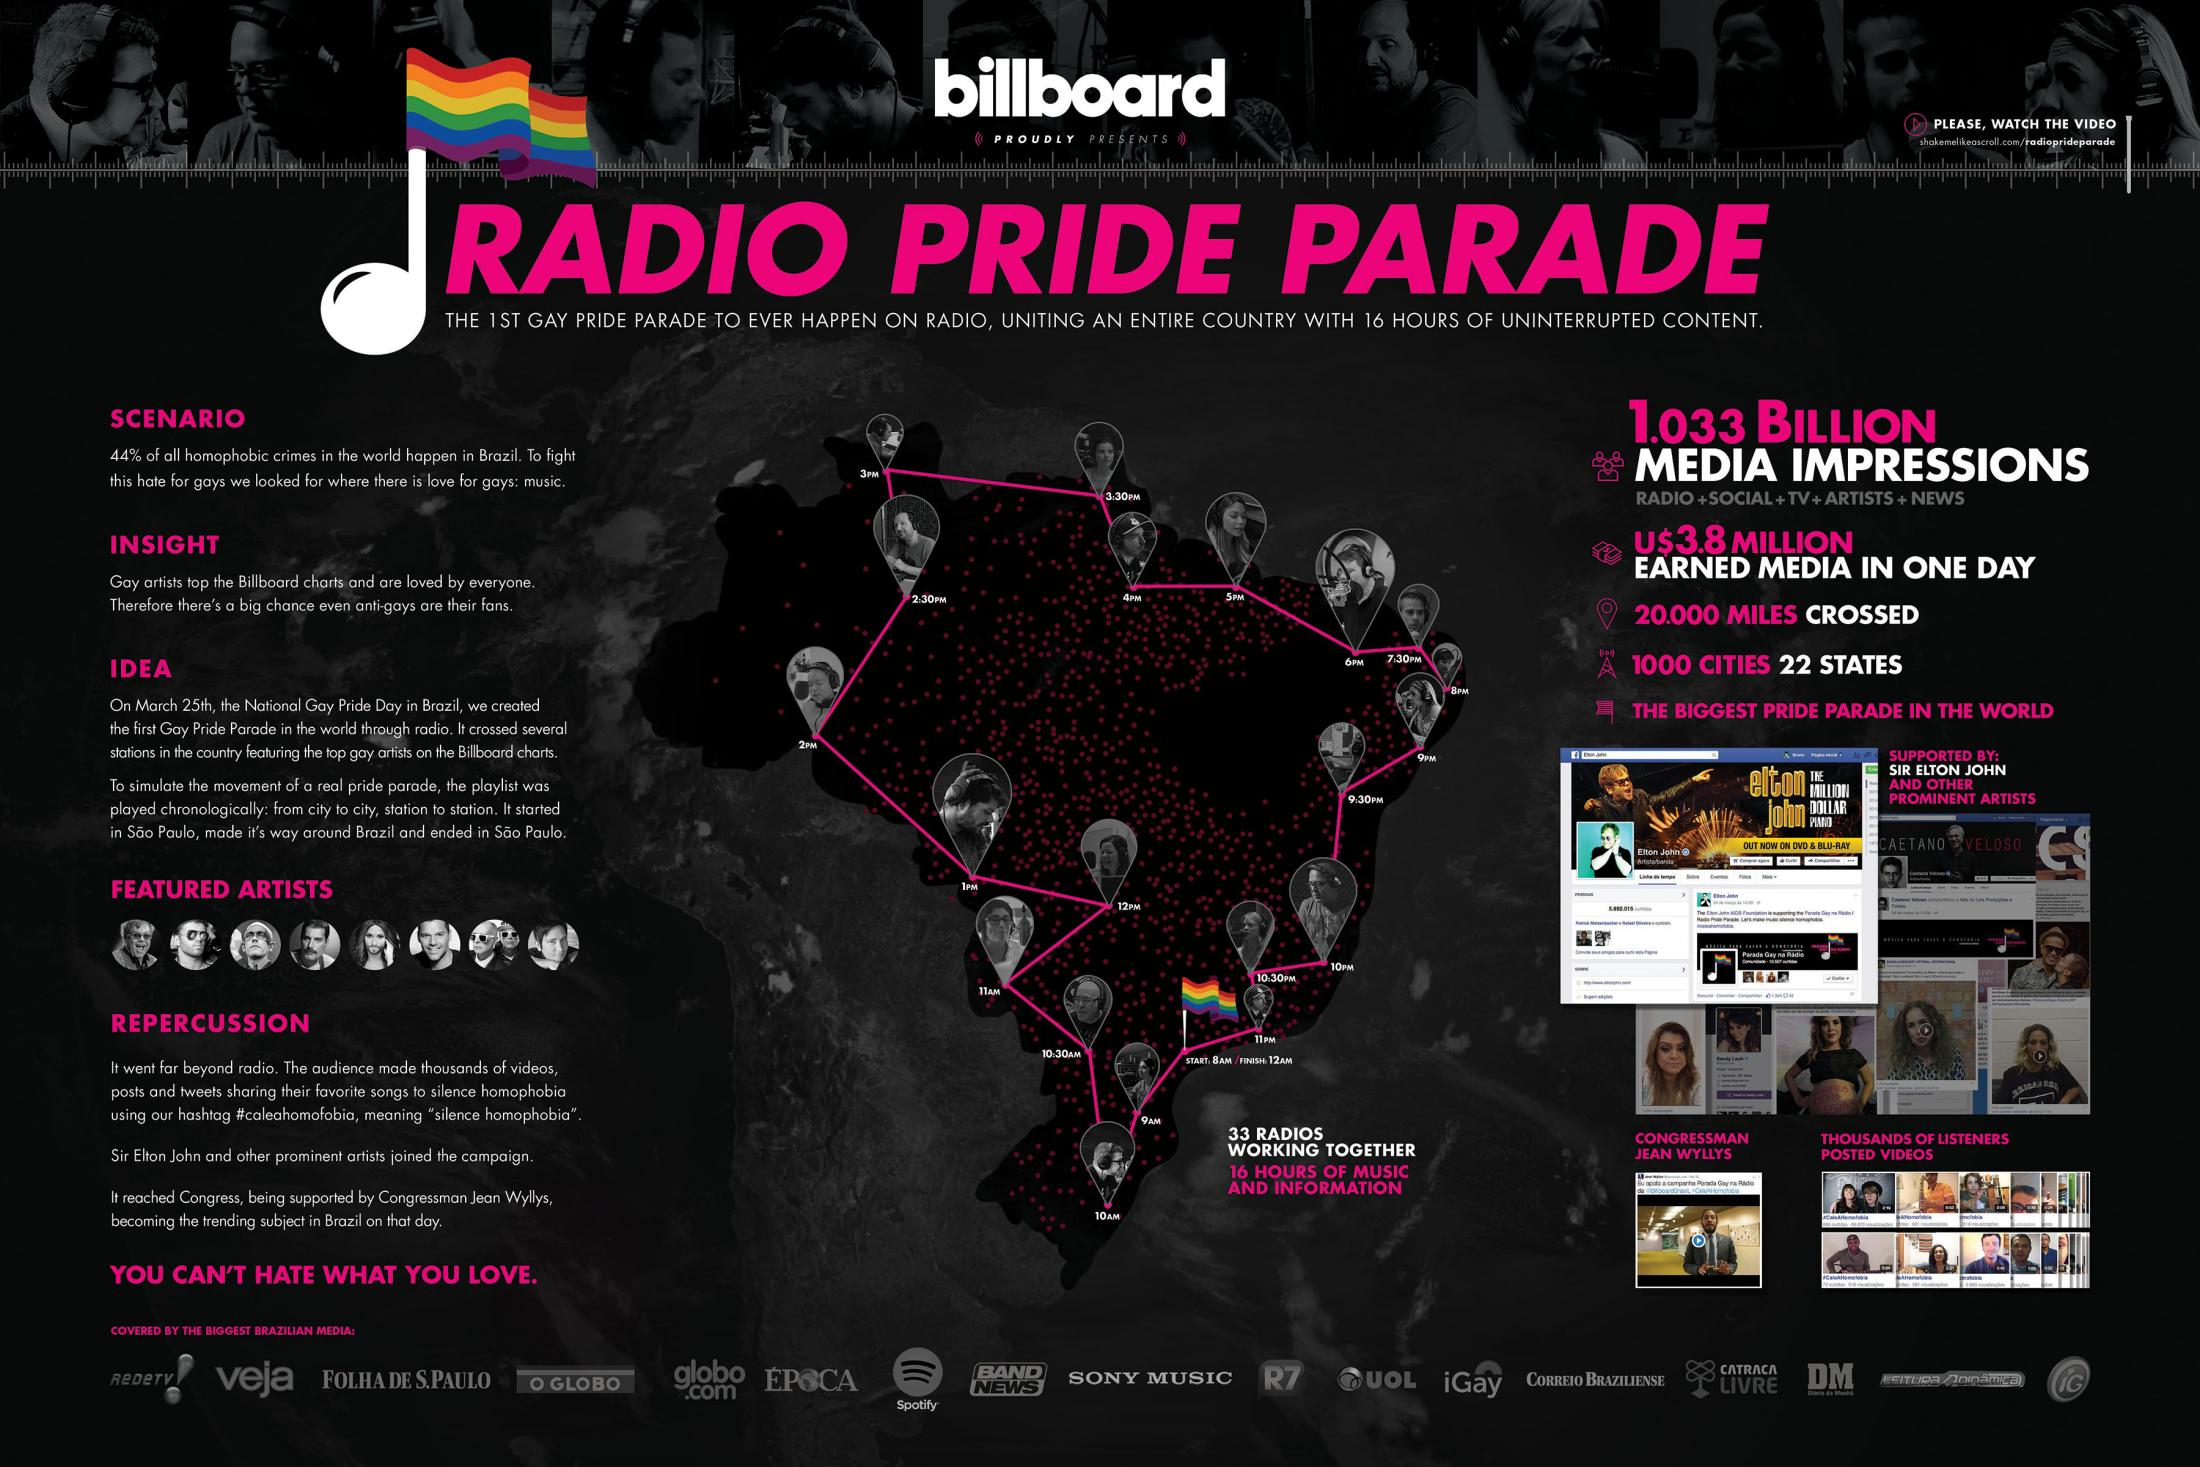 Thumbnail for Radio Pride Parade